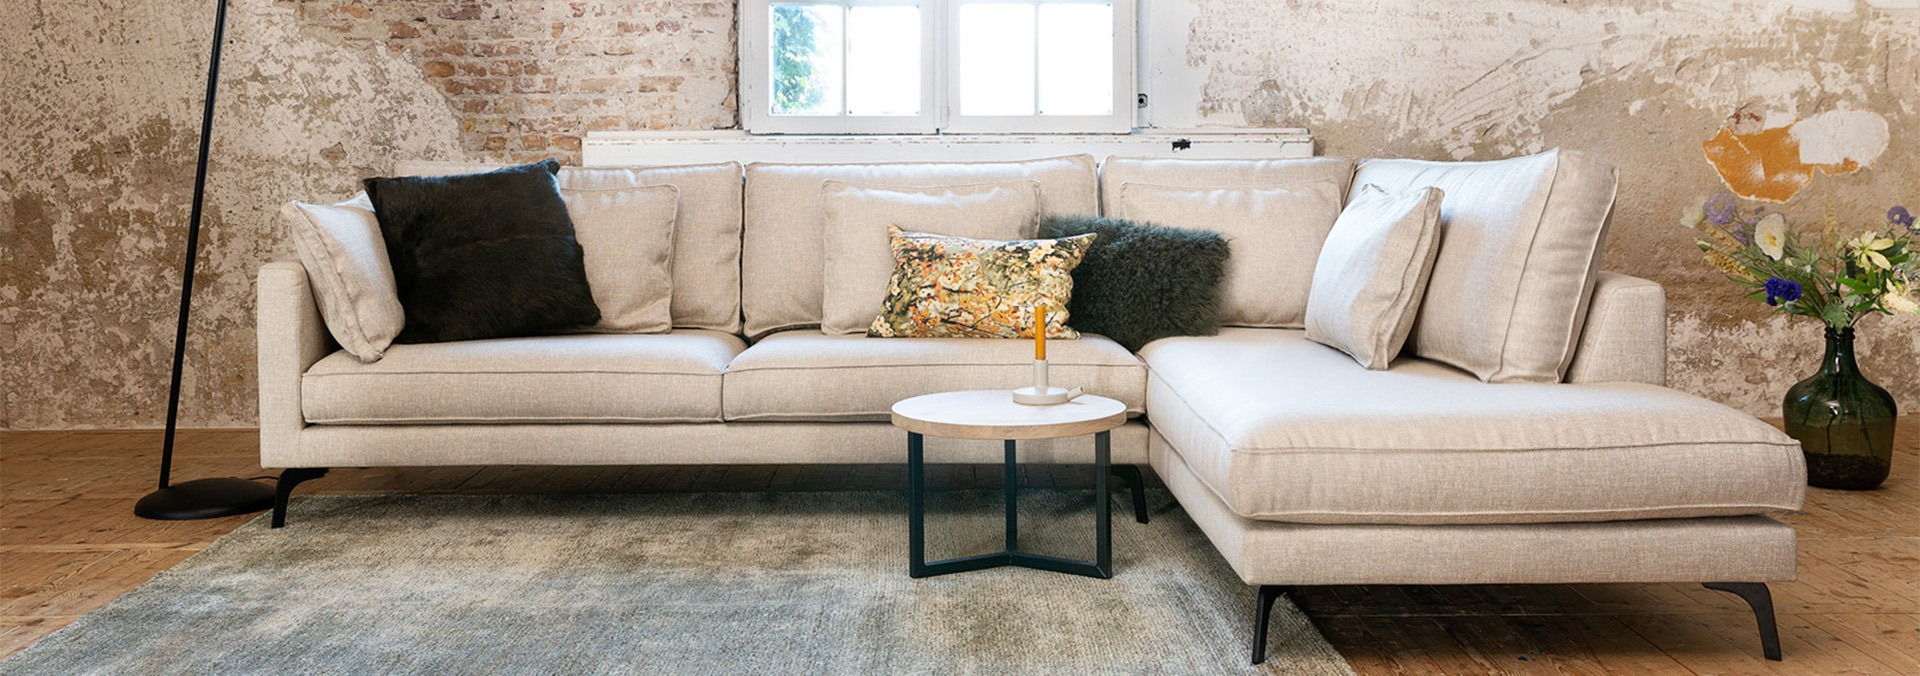 haveli-dreams-hoekbank-ottoman-creme-stof-soofs-interieur-home